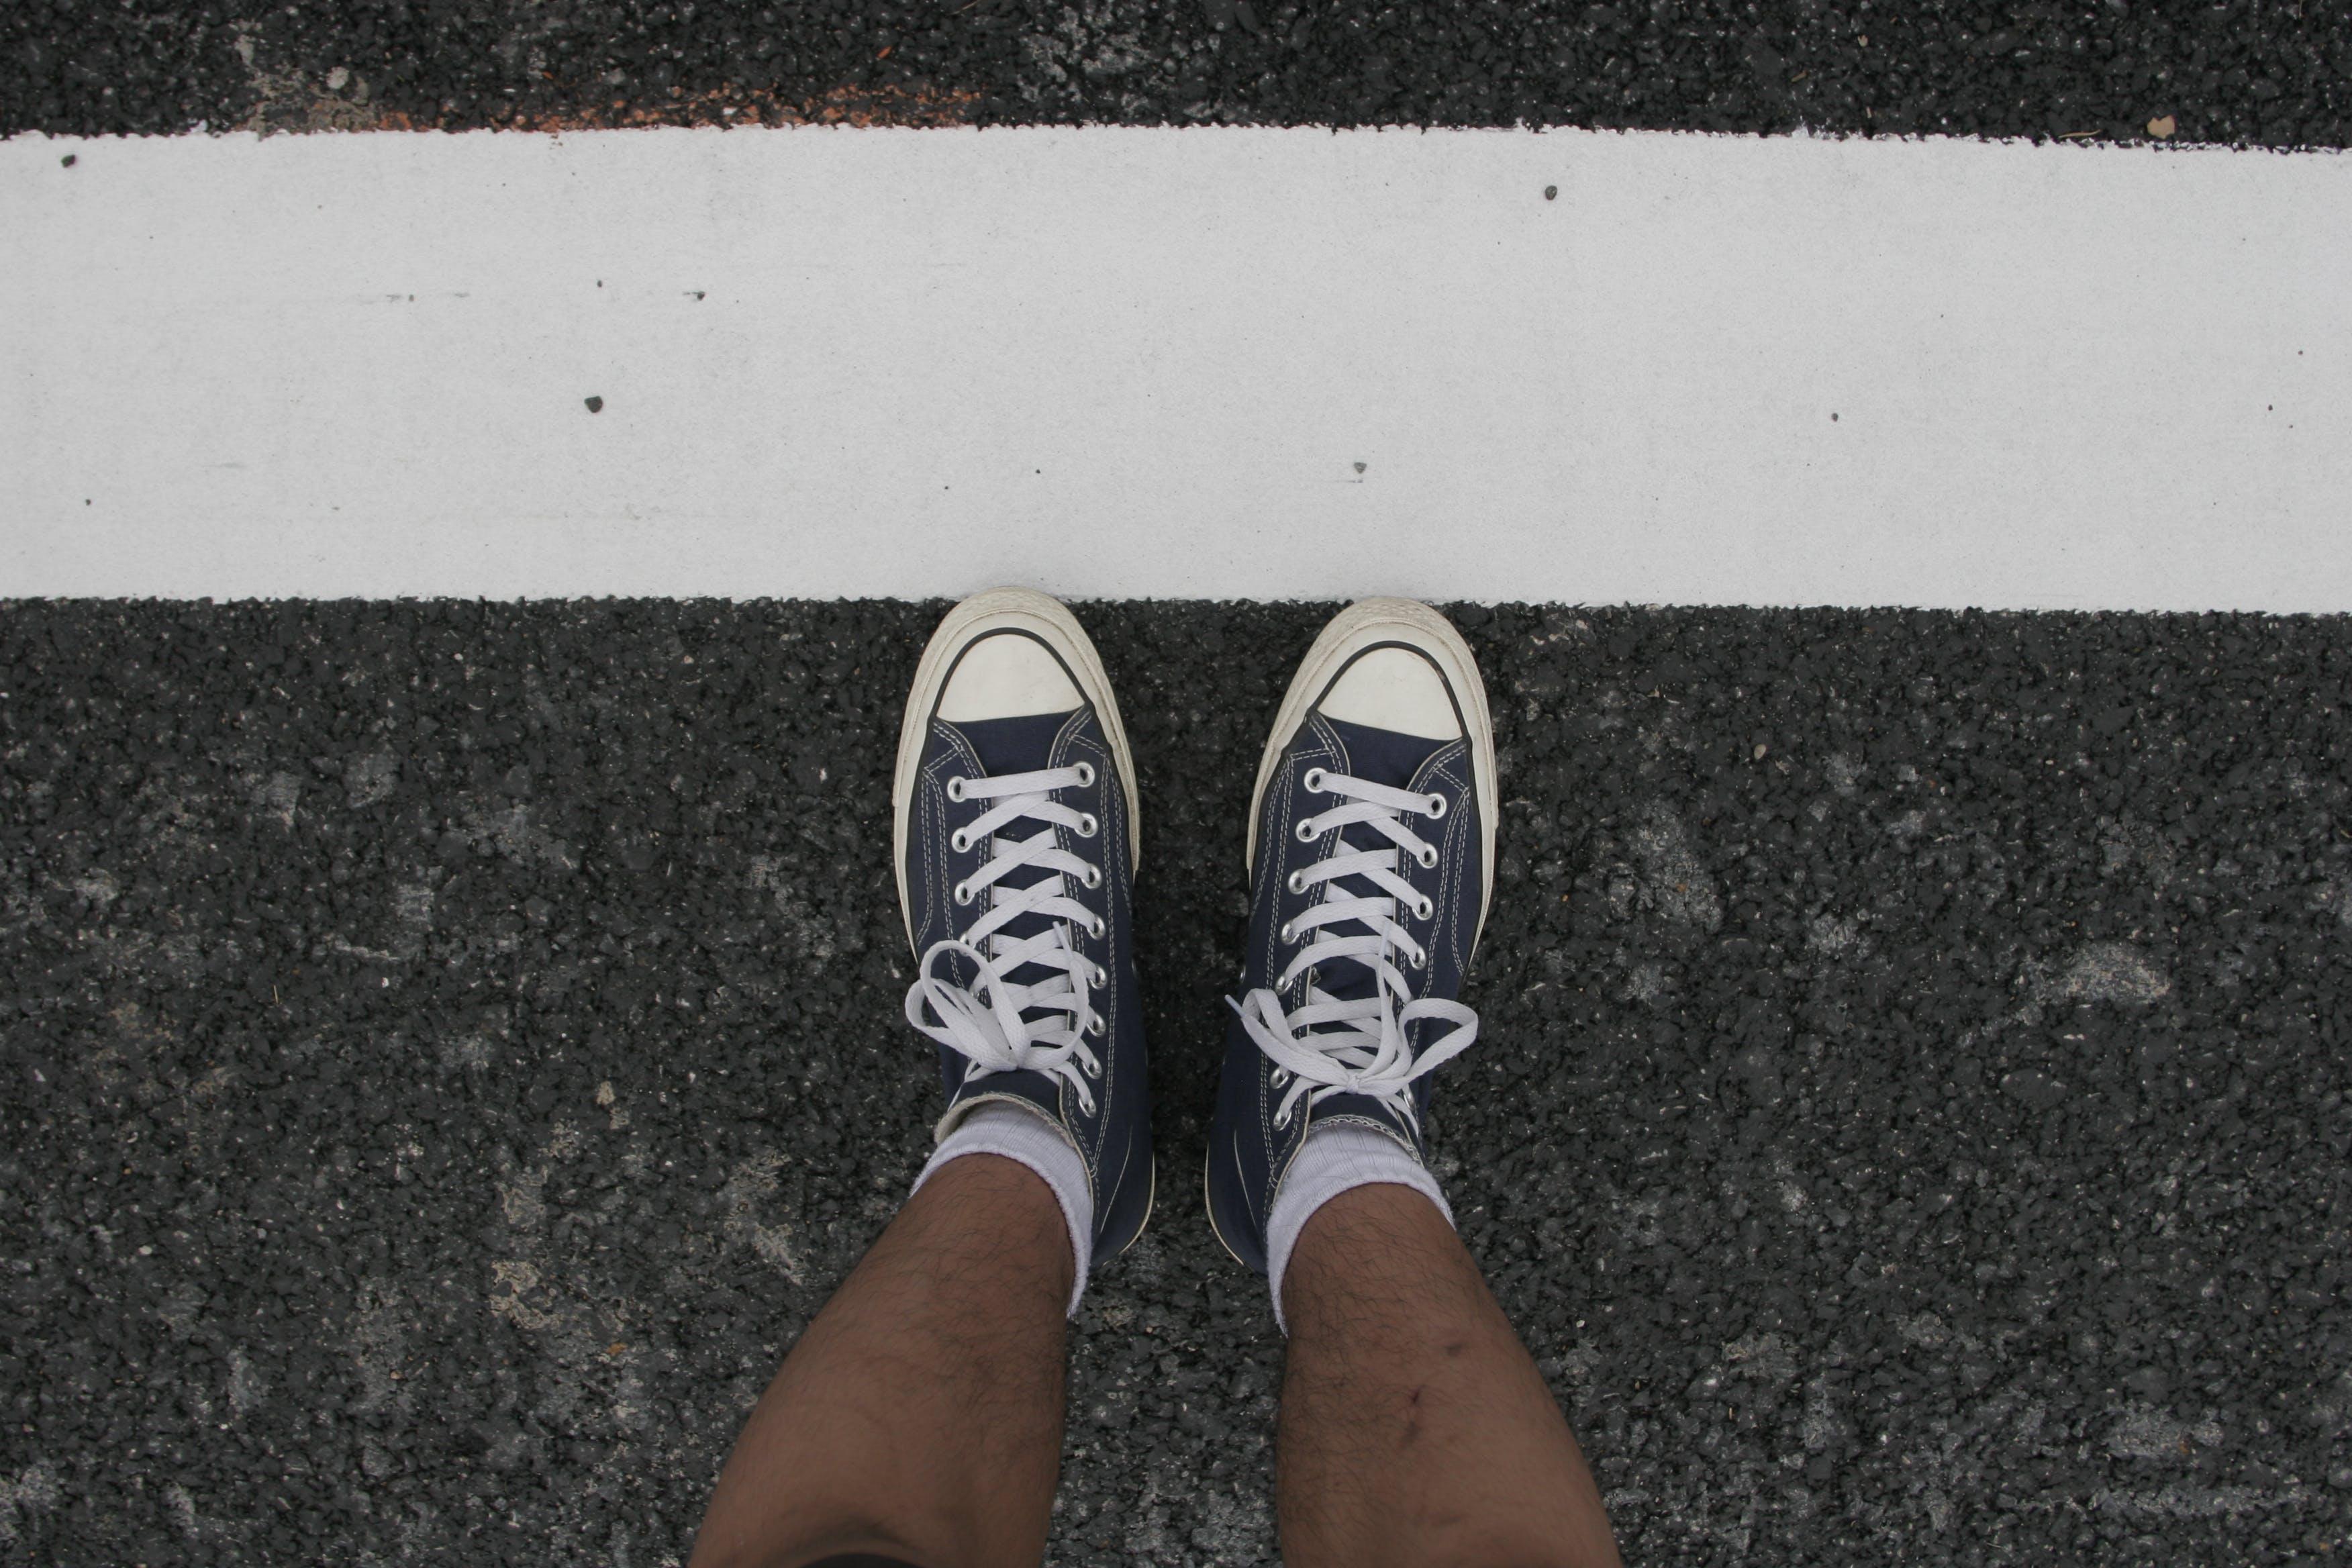 Gratis lagerfoto af asfalt, fodtøj, gummisko, kø